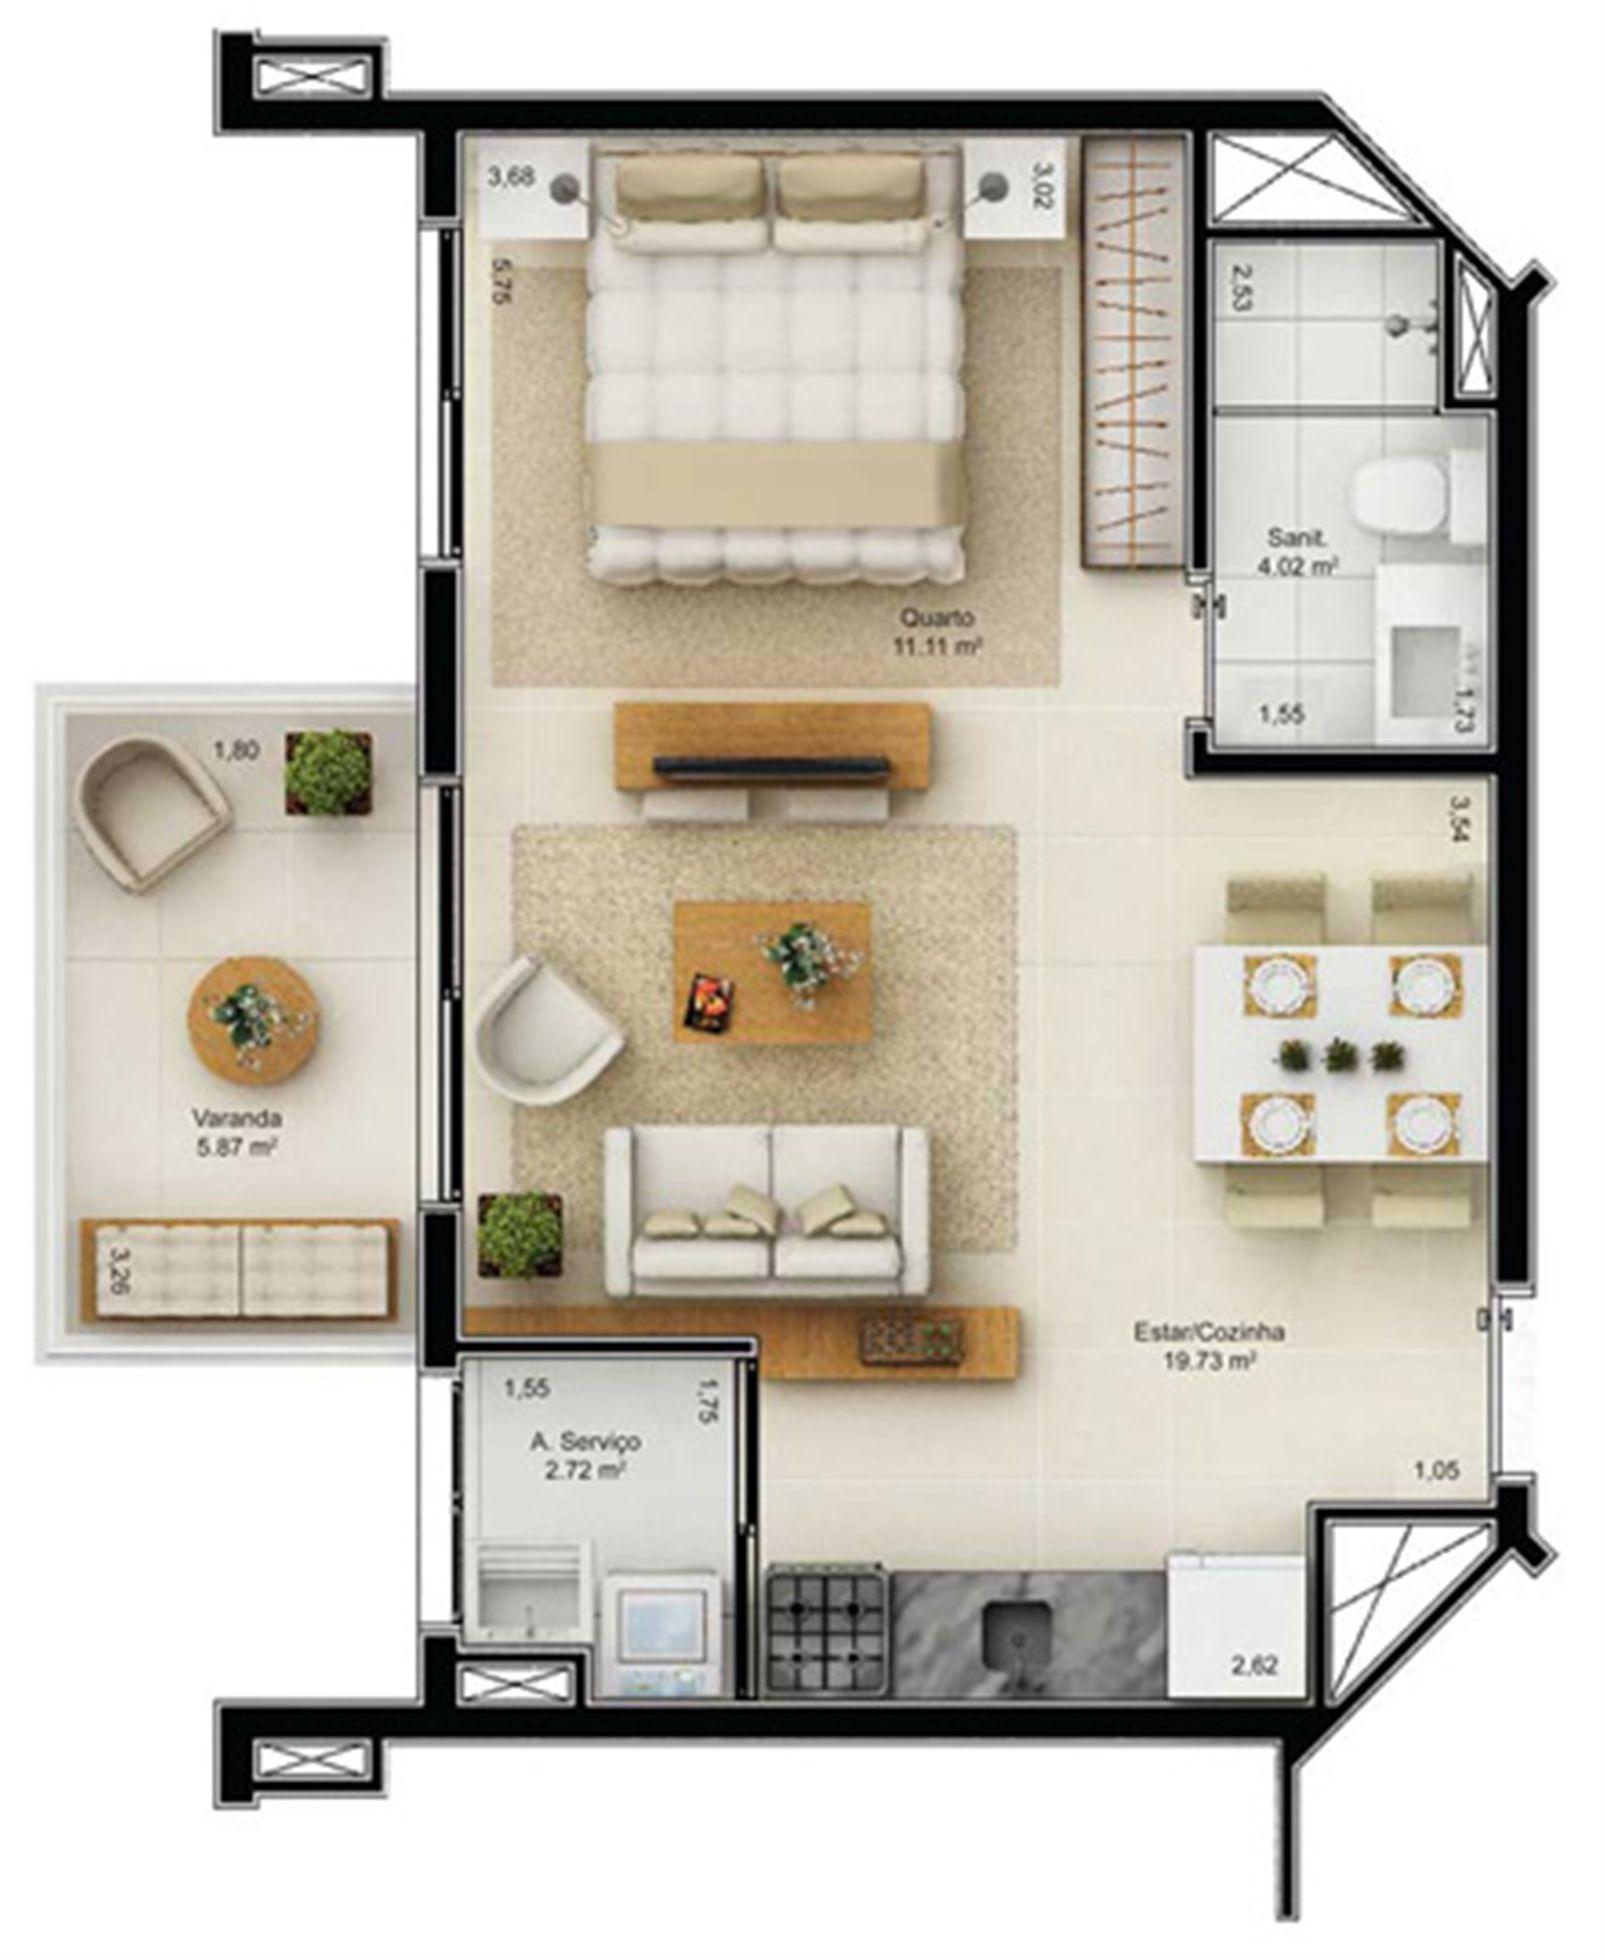 Planta Tipo 43,45 m² | Mandarim Salvador Shopping – Apartamento  Ao lado do Salvador Shopping - Salvador - Bahia